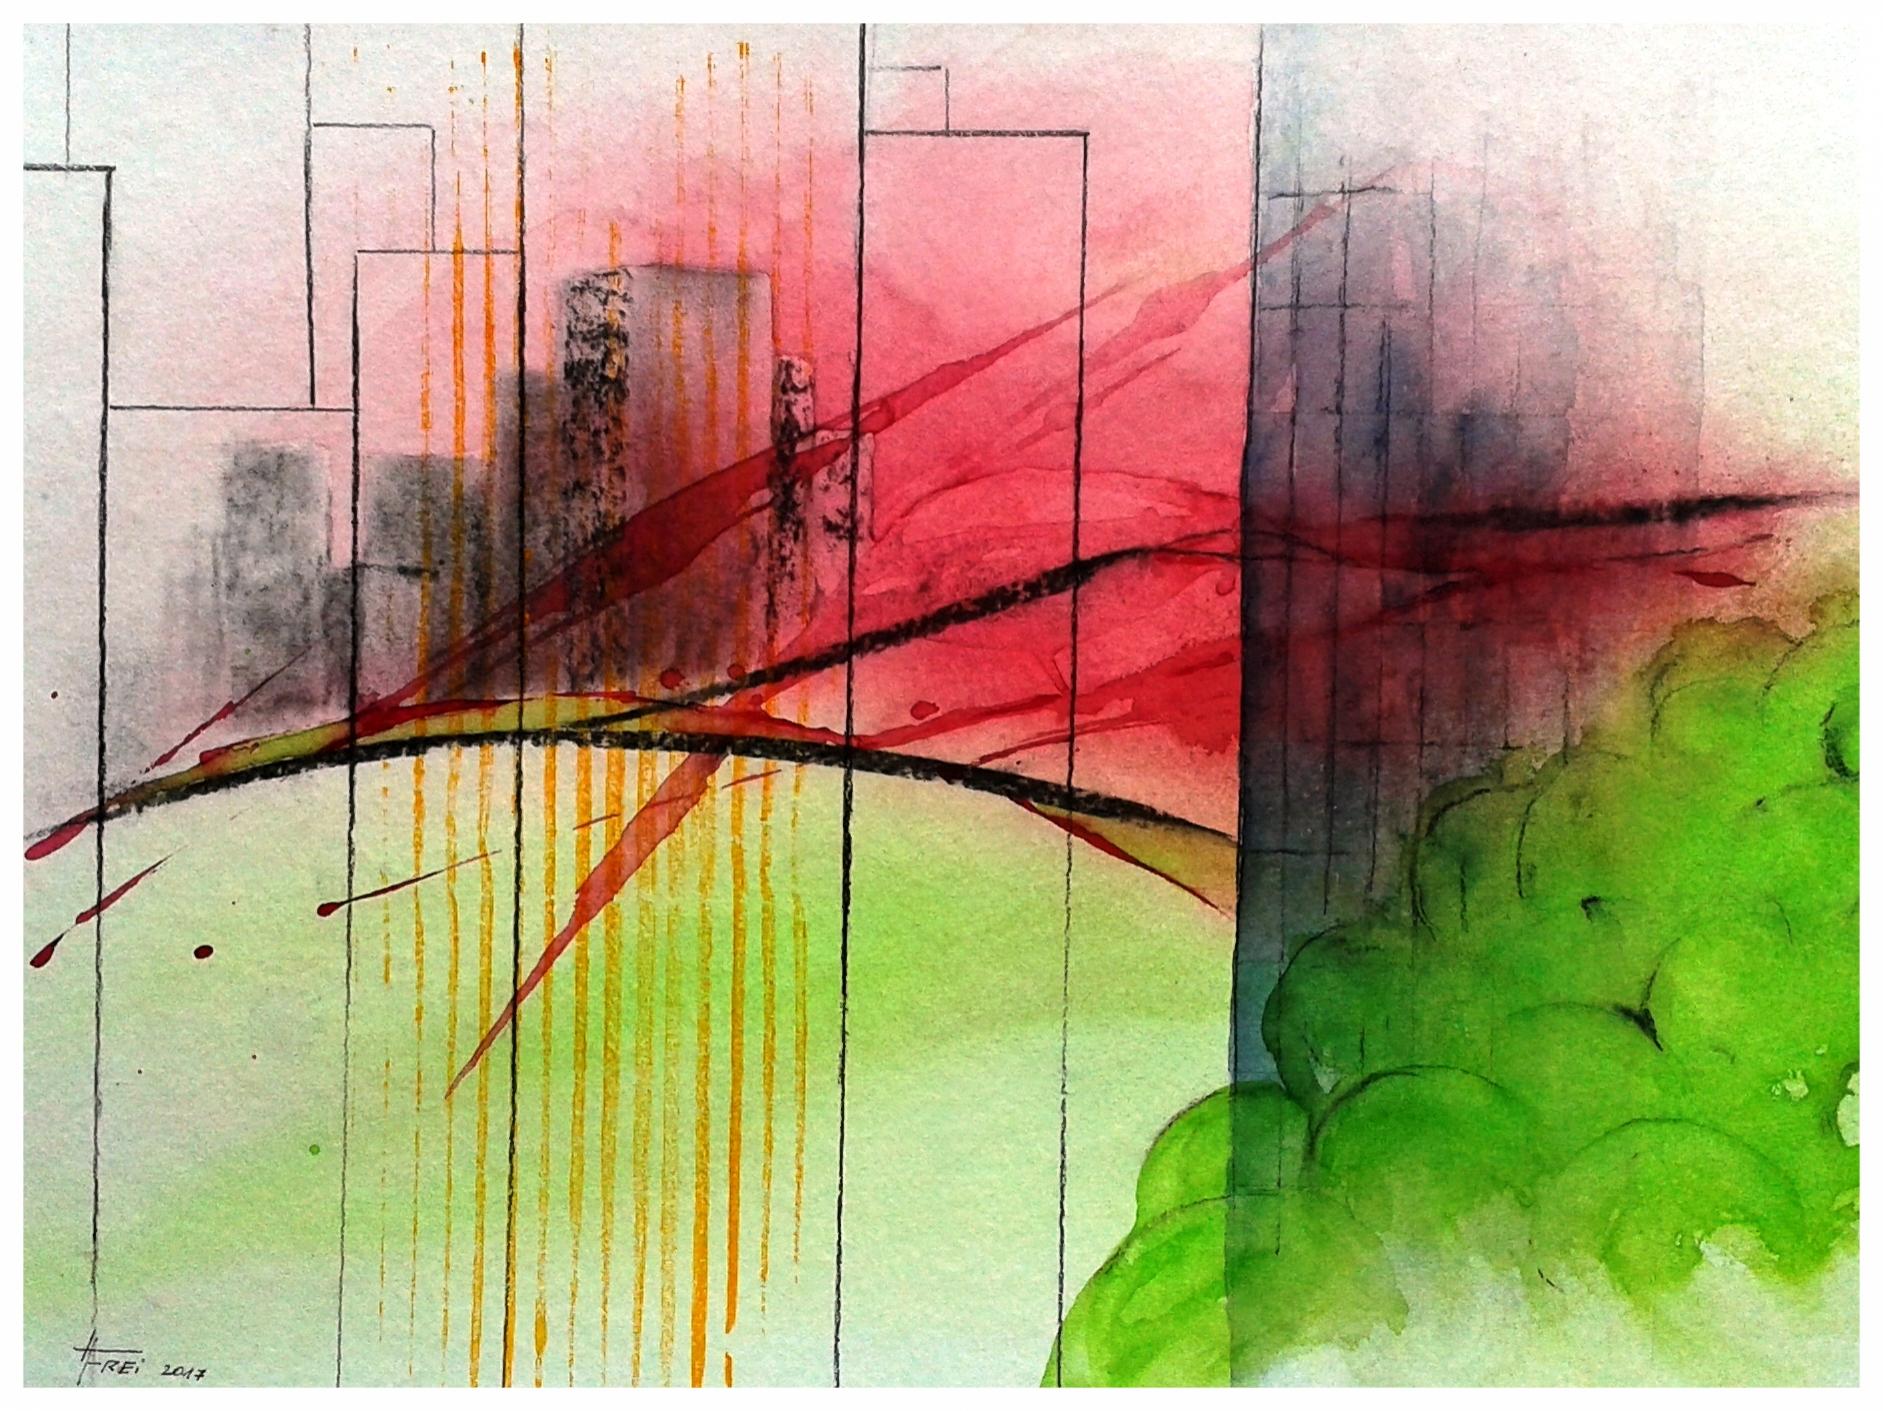 ART HFrei - Landflucht